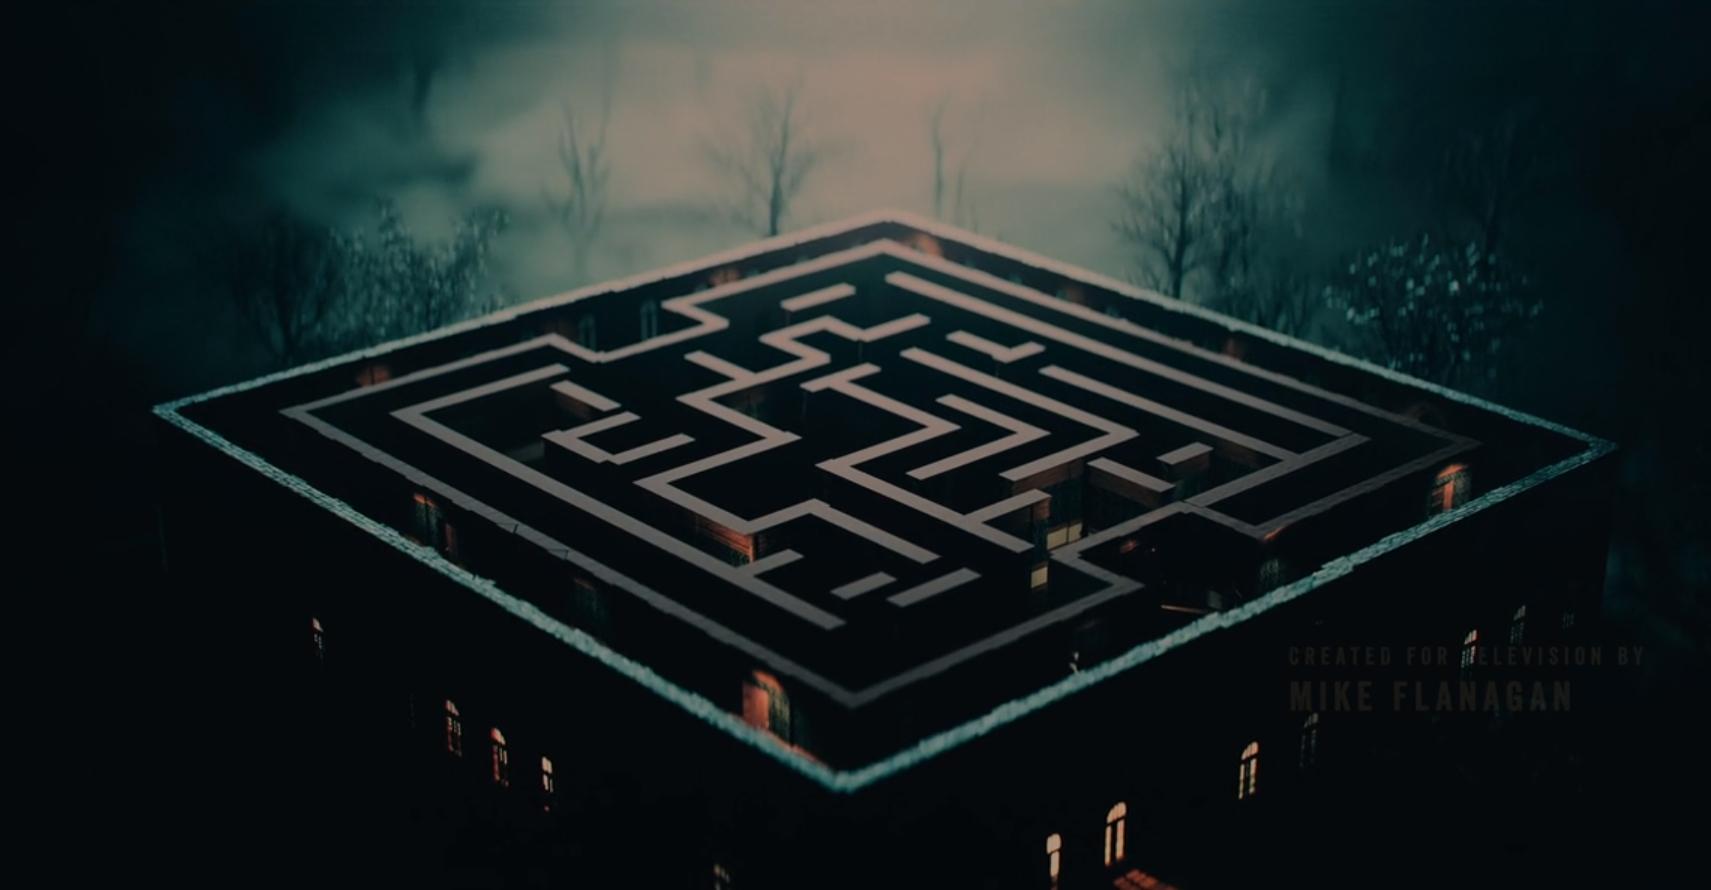 https://seriesaddict.fr/images/labyrinthe.jpg